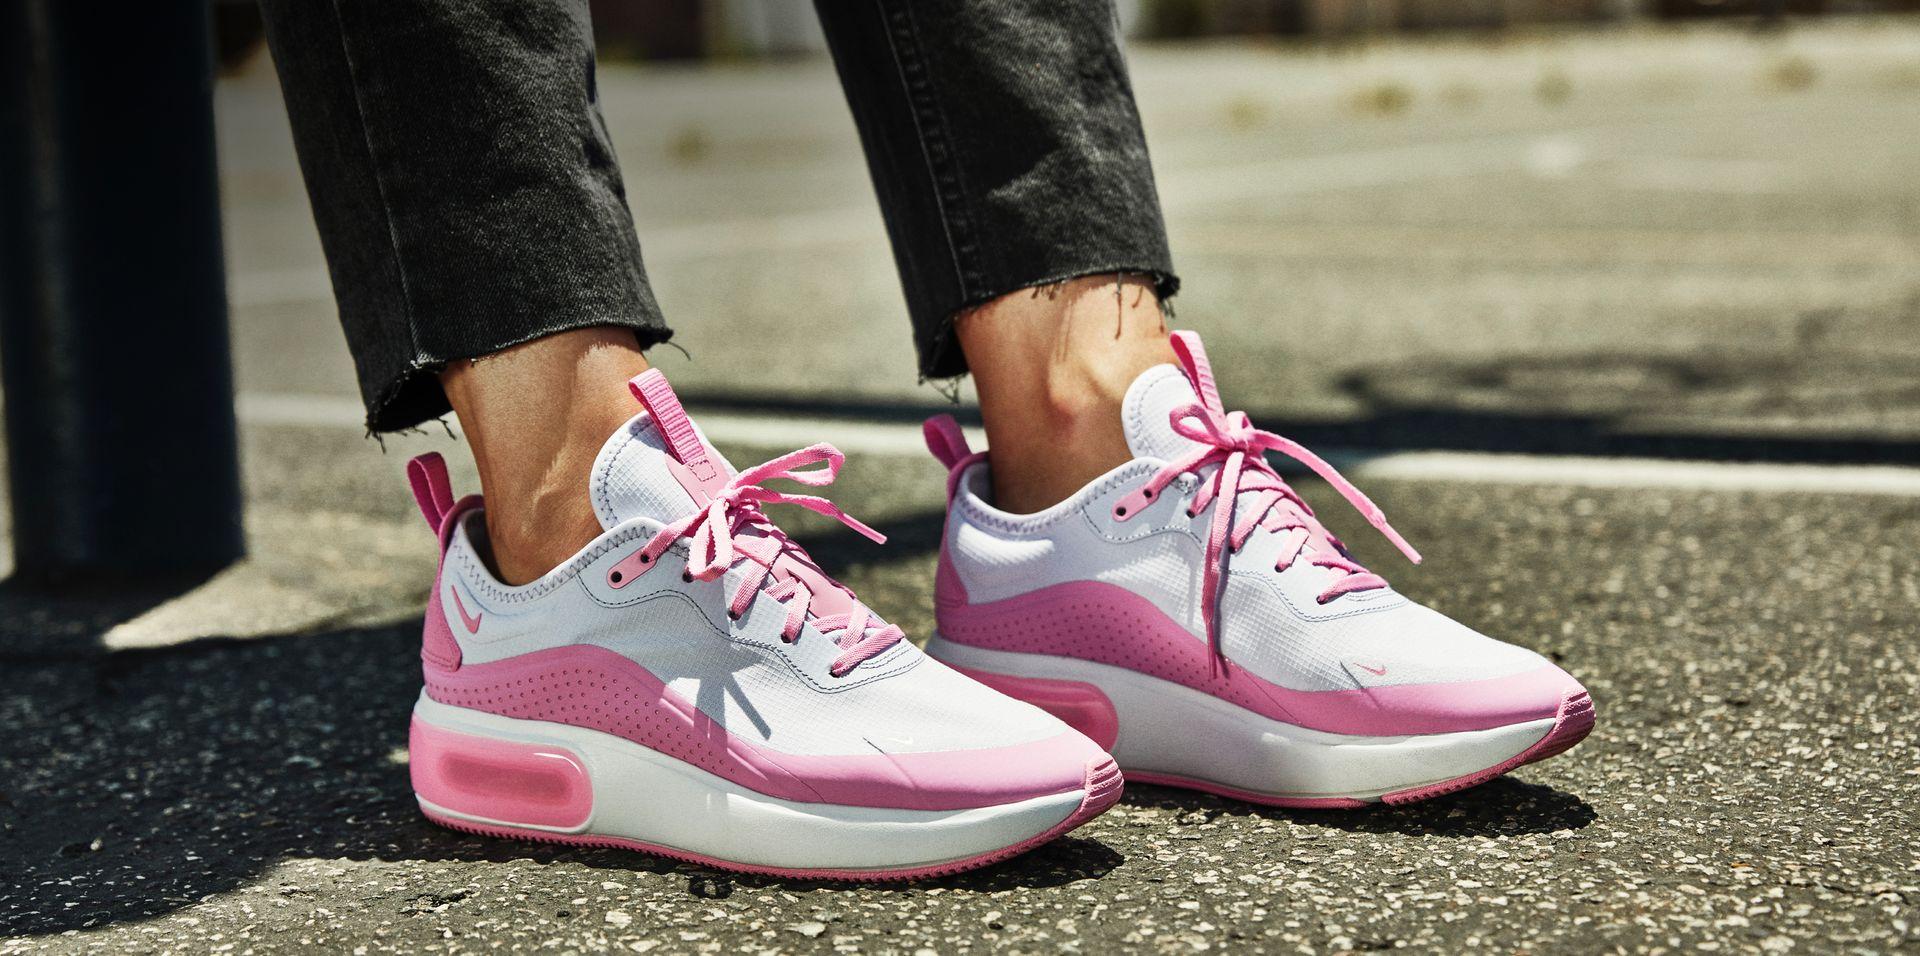 Nike Women's Shoes, Clothing and Gear  Nike com